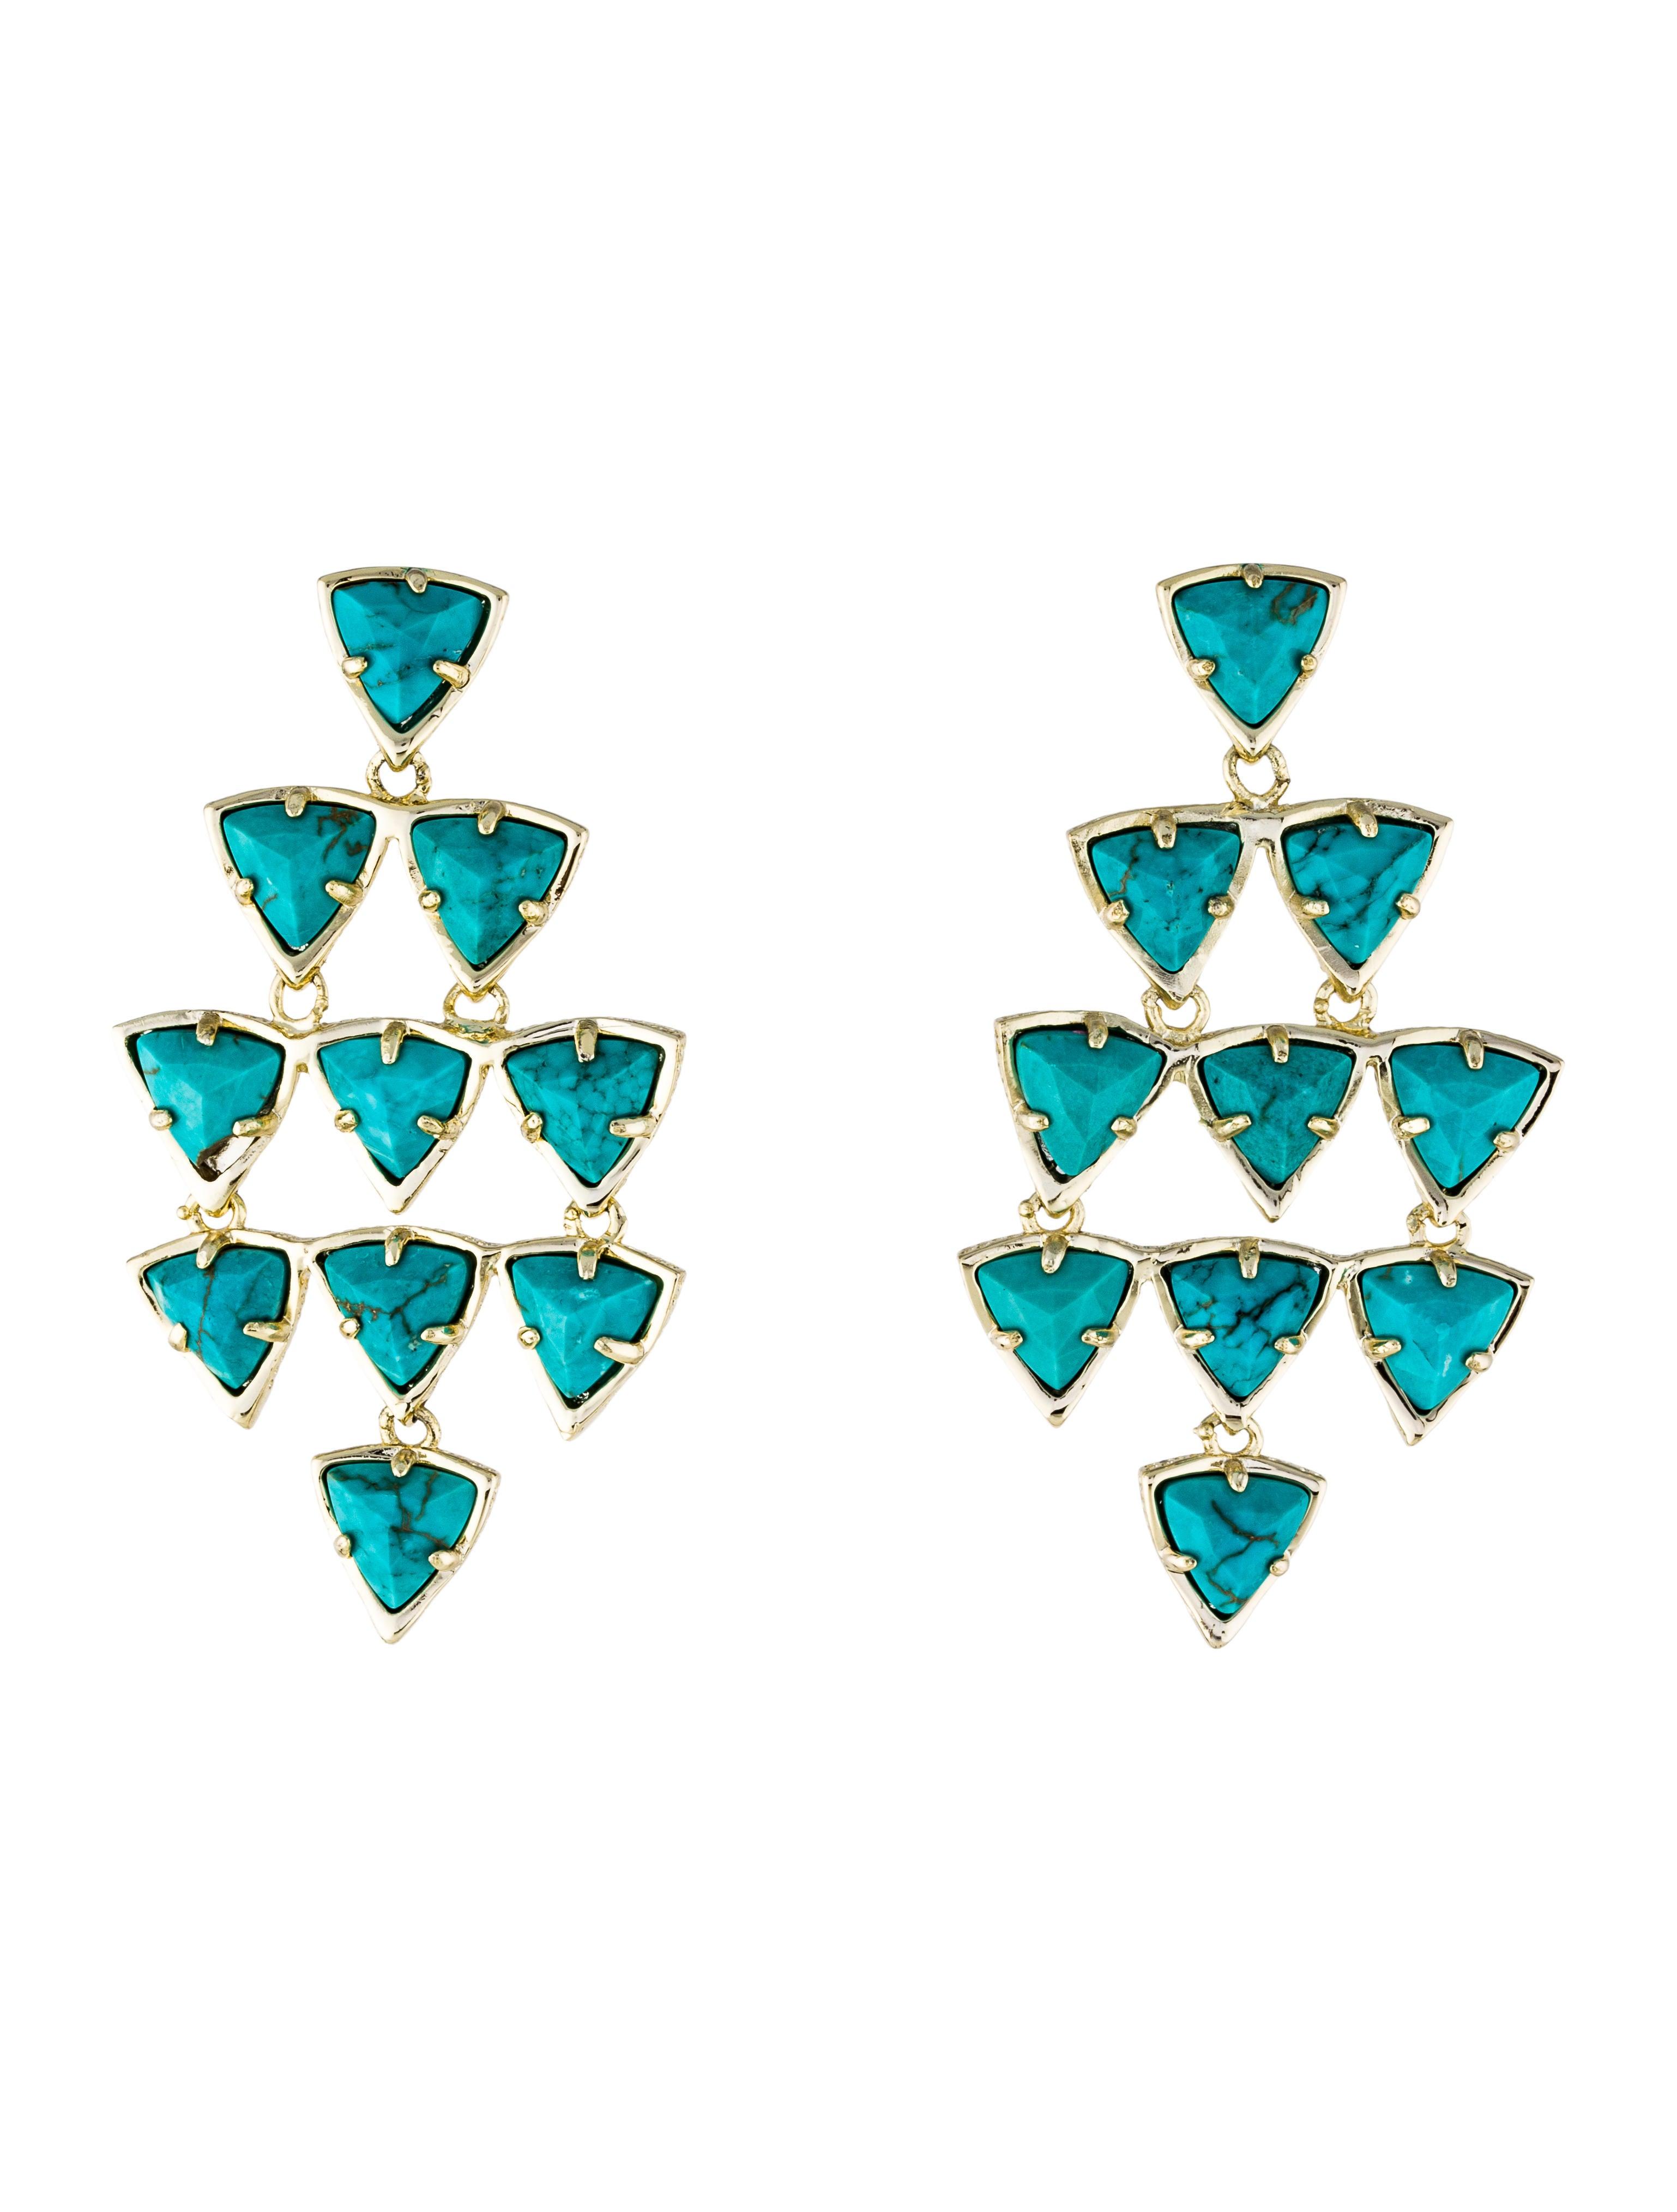 Kendra scott vale turquoise magnesite chandelier earrings earrings vale turquoise magnesite chandelier earrings arubaitofo Images